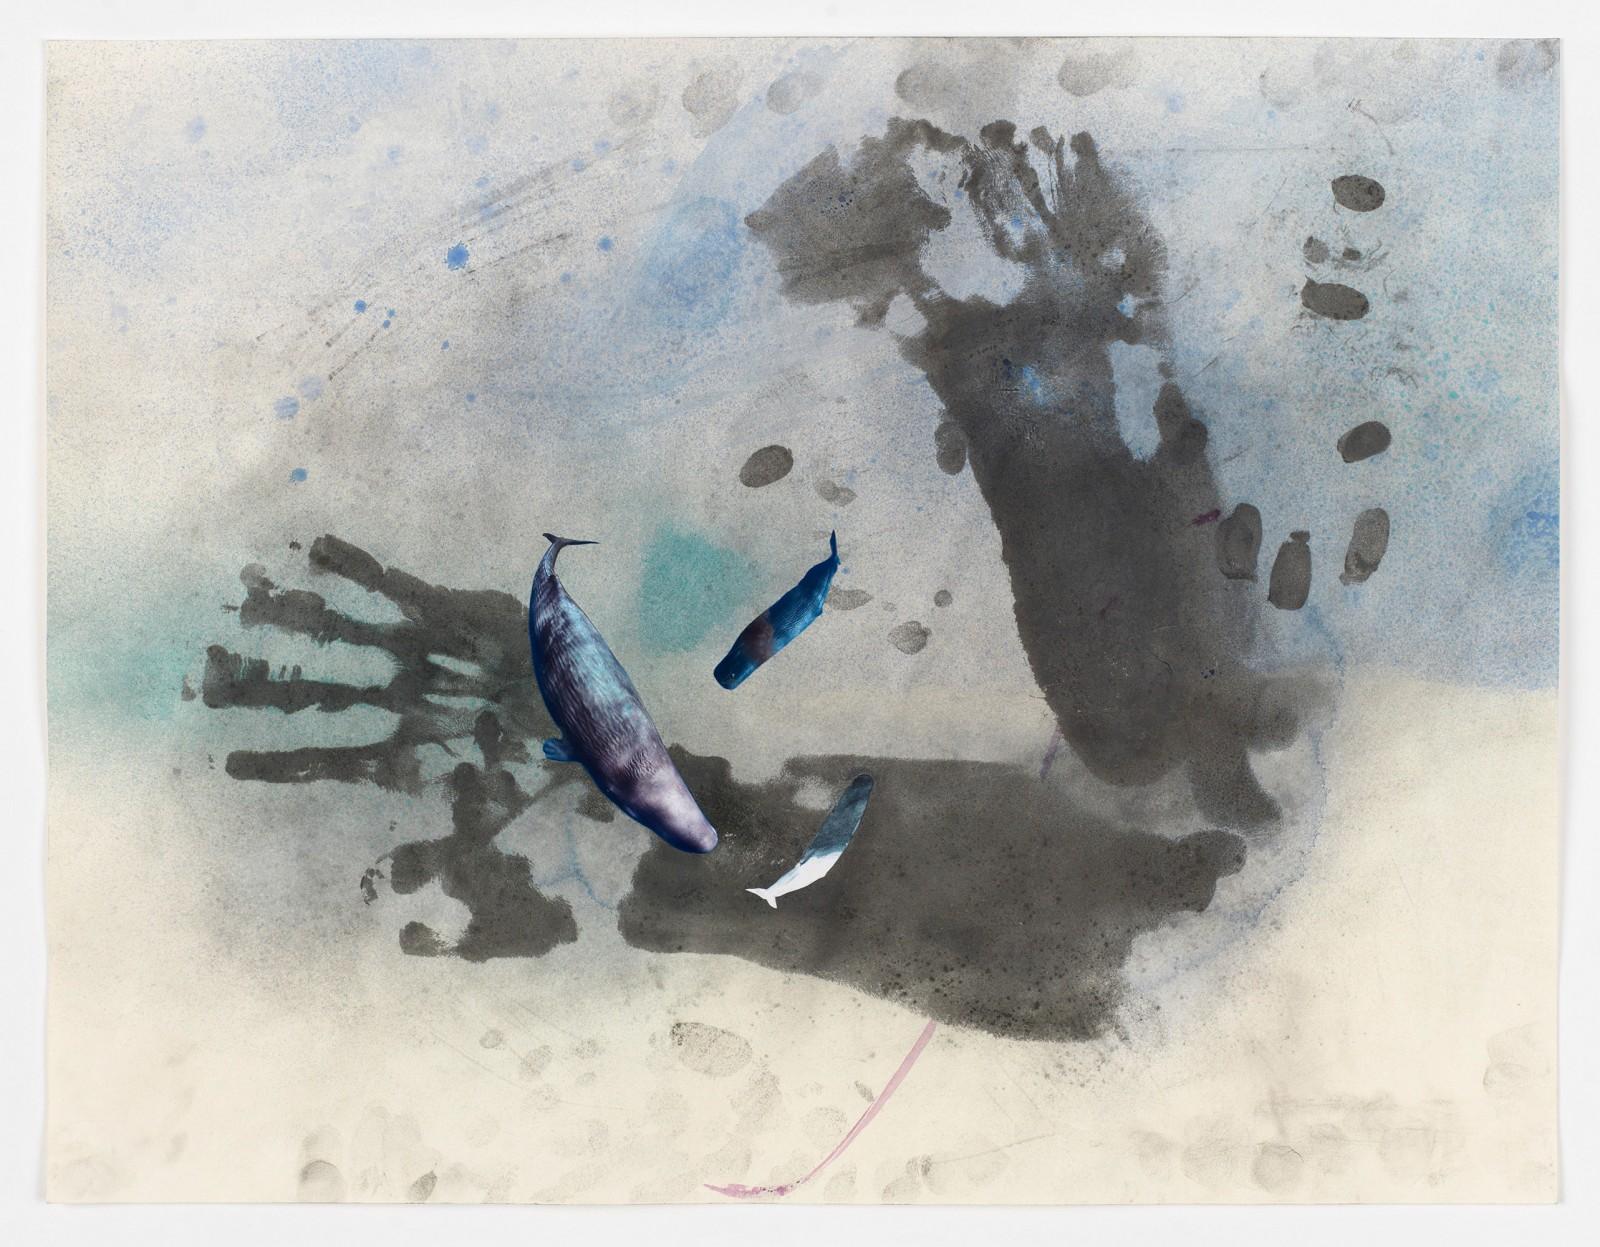 Kim Nekarda: untitled, 2016, body print, photocopy & watercolour on paper, 54 x 70  cm